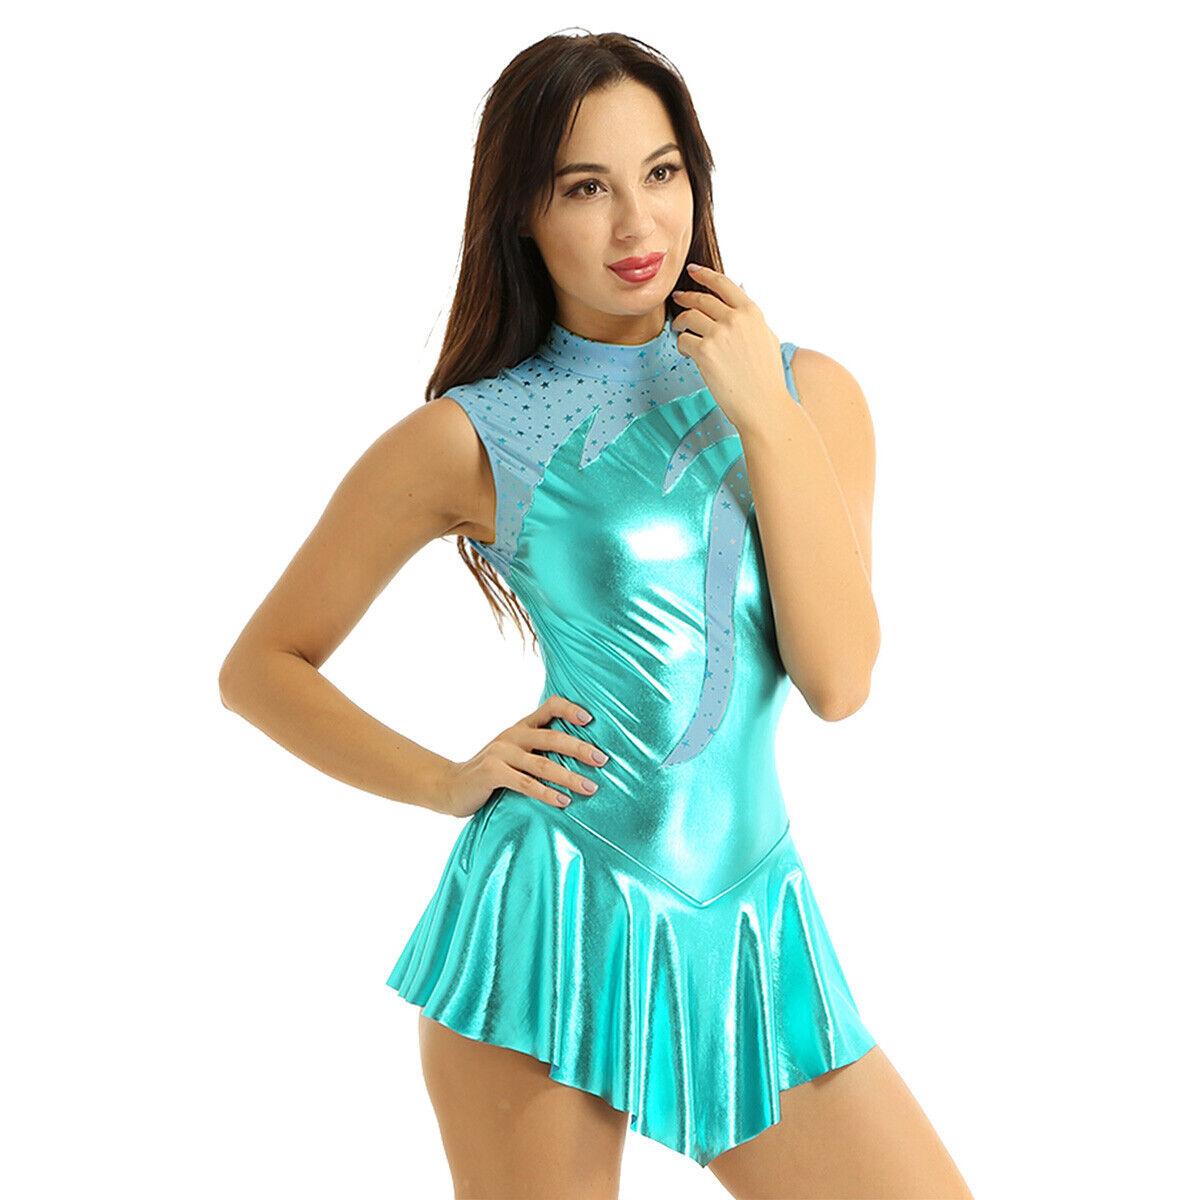 Girl Ladies Figure Ice Skating Leotard Dress Shiny Metallic Ballet Dancewear Gym